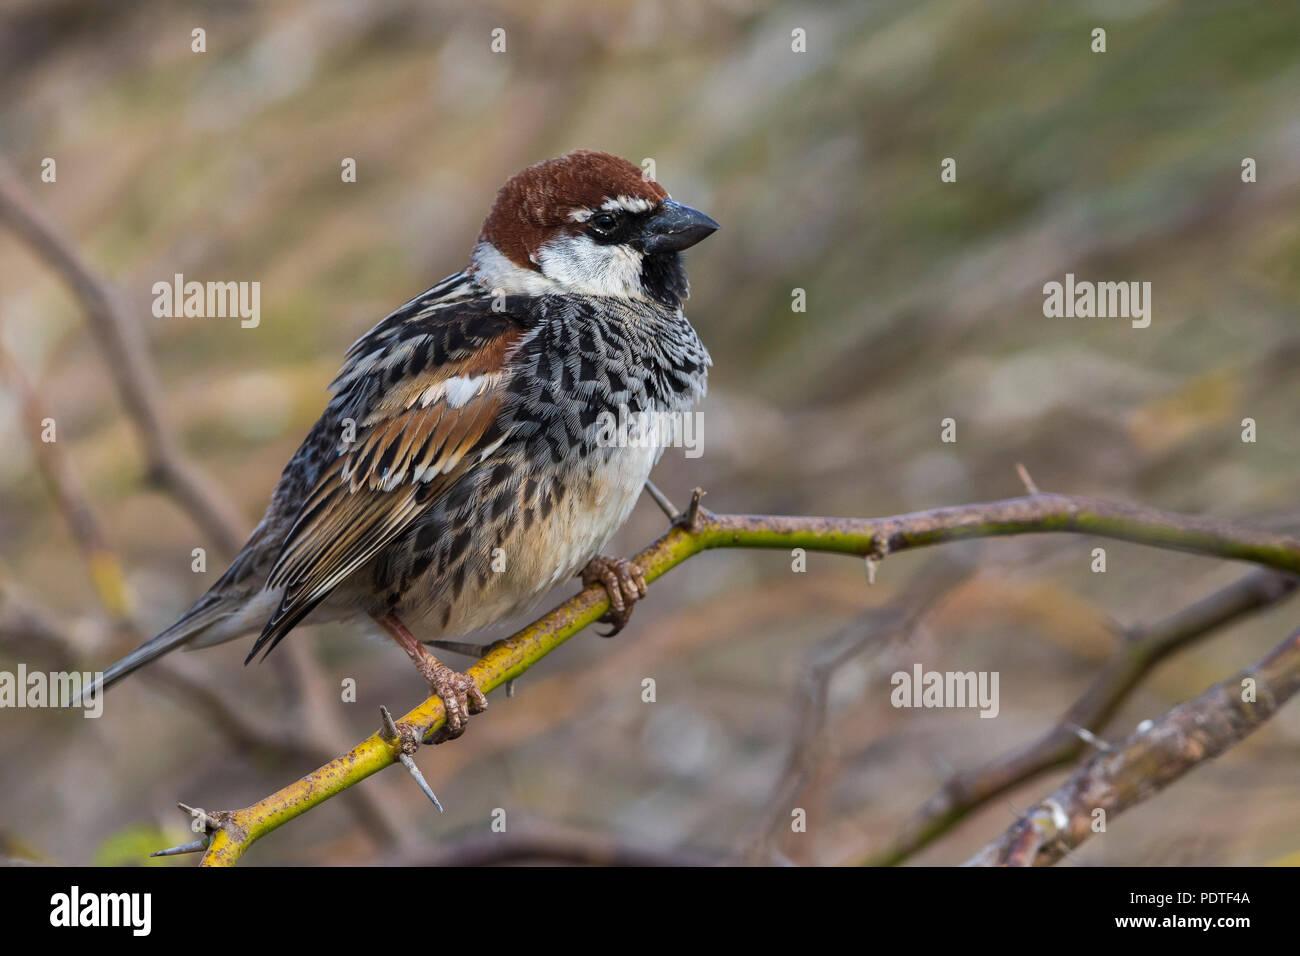 Spanish Sparrow; Passer hispaniolensis Stock Photo